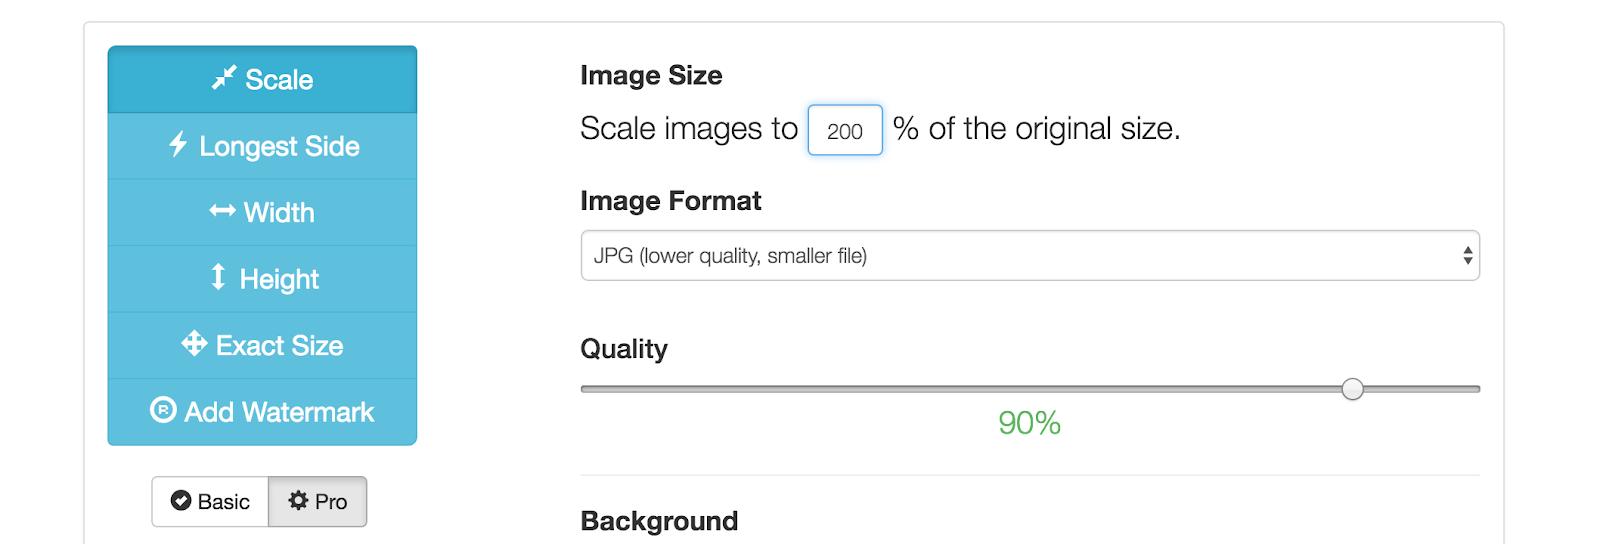 Make the Picture Bigger? - Image Enlarger - Free Online Image Editing